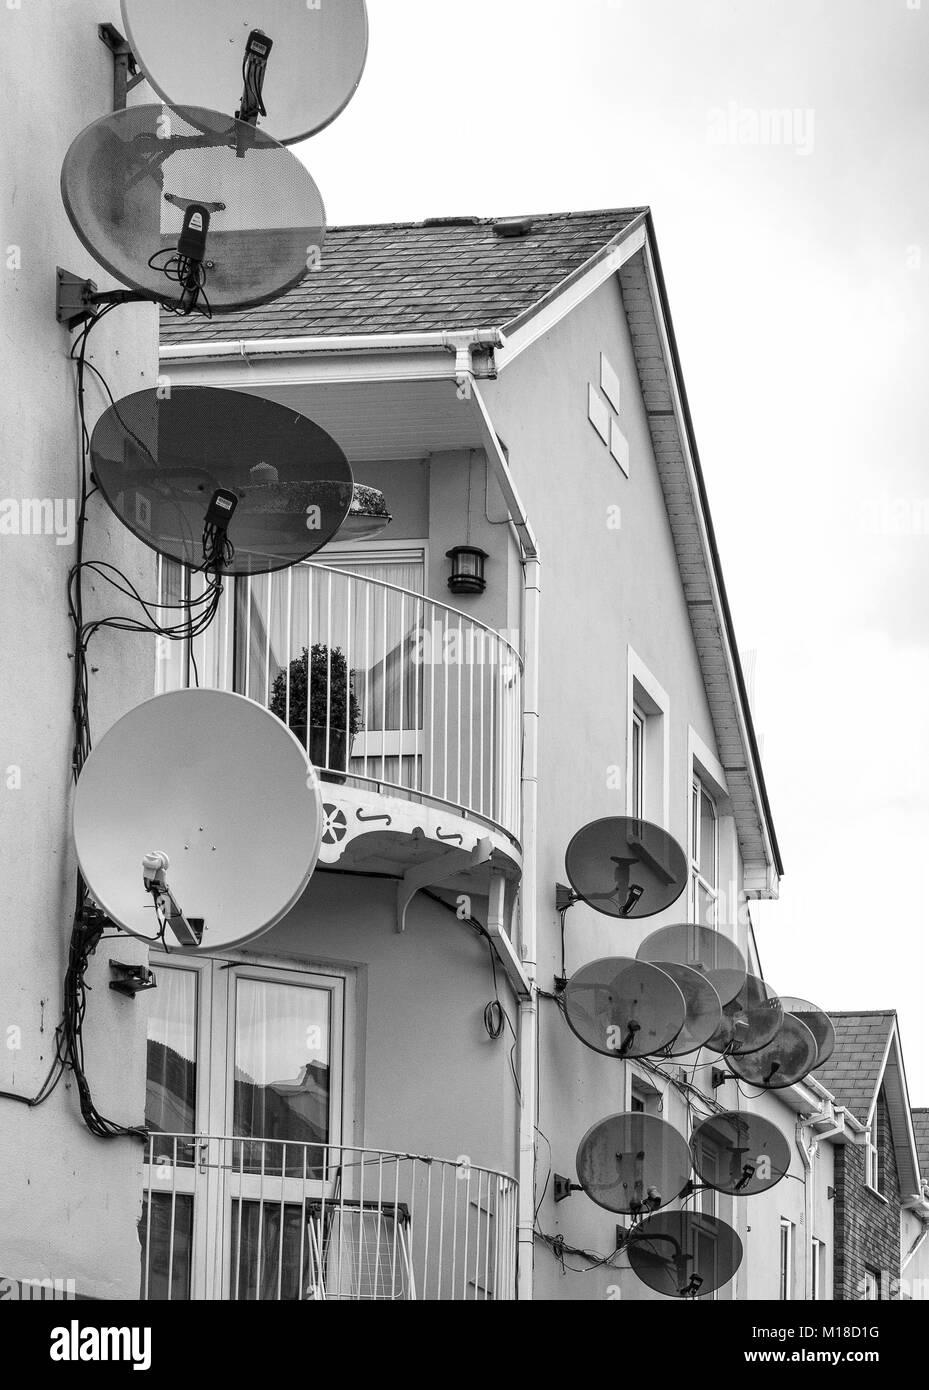 Satellite aerials on apartments - Stock Image